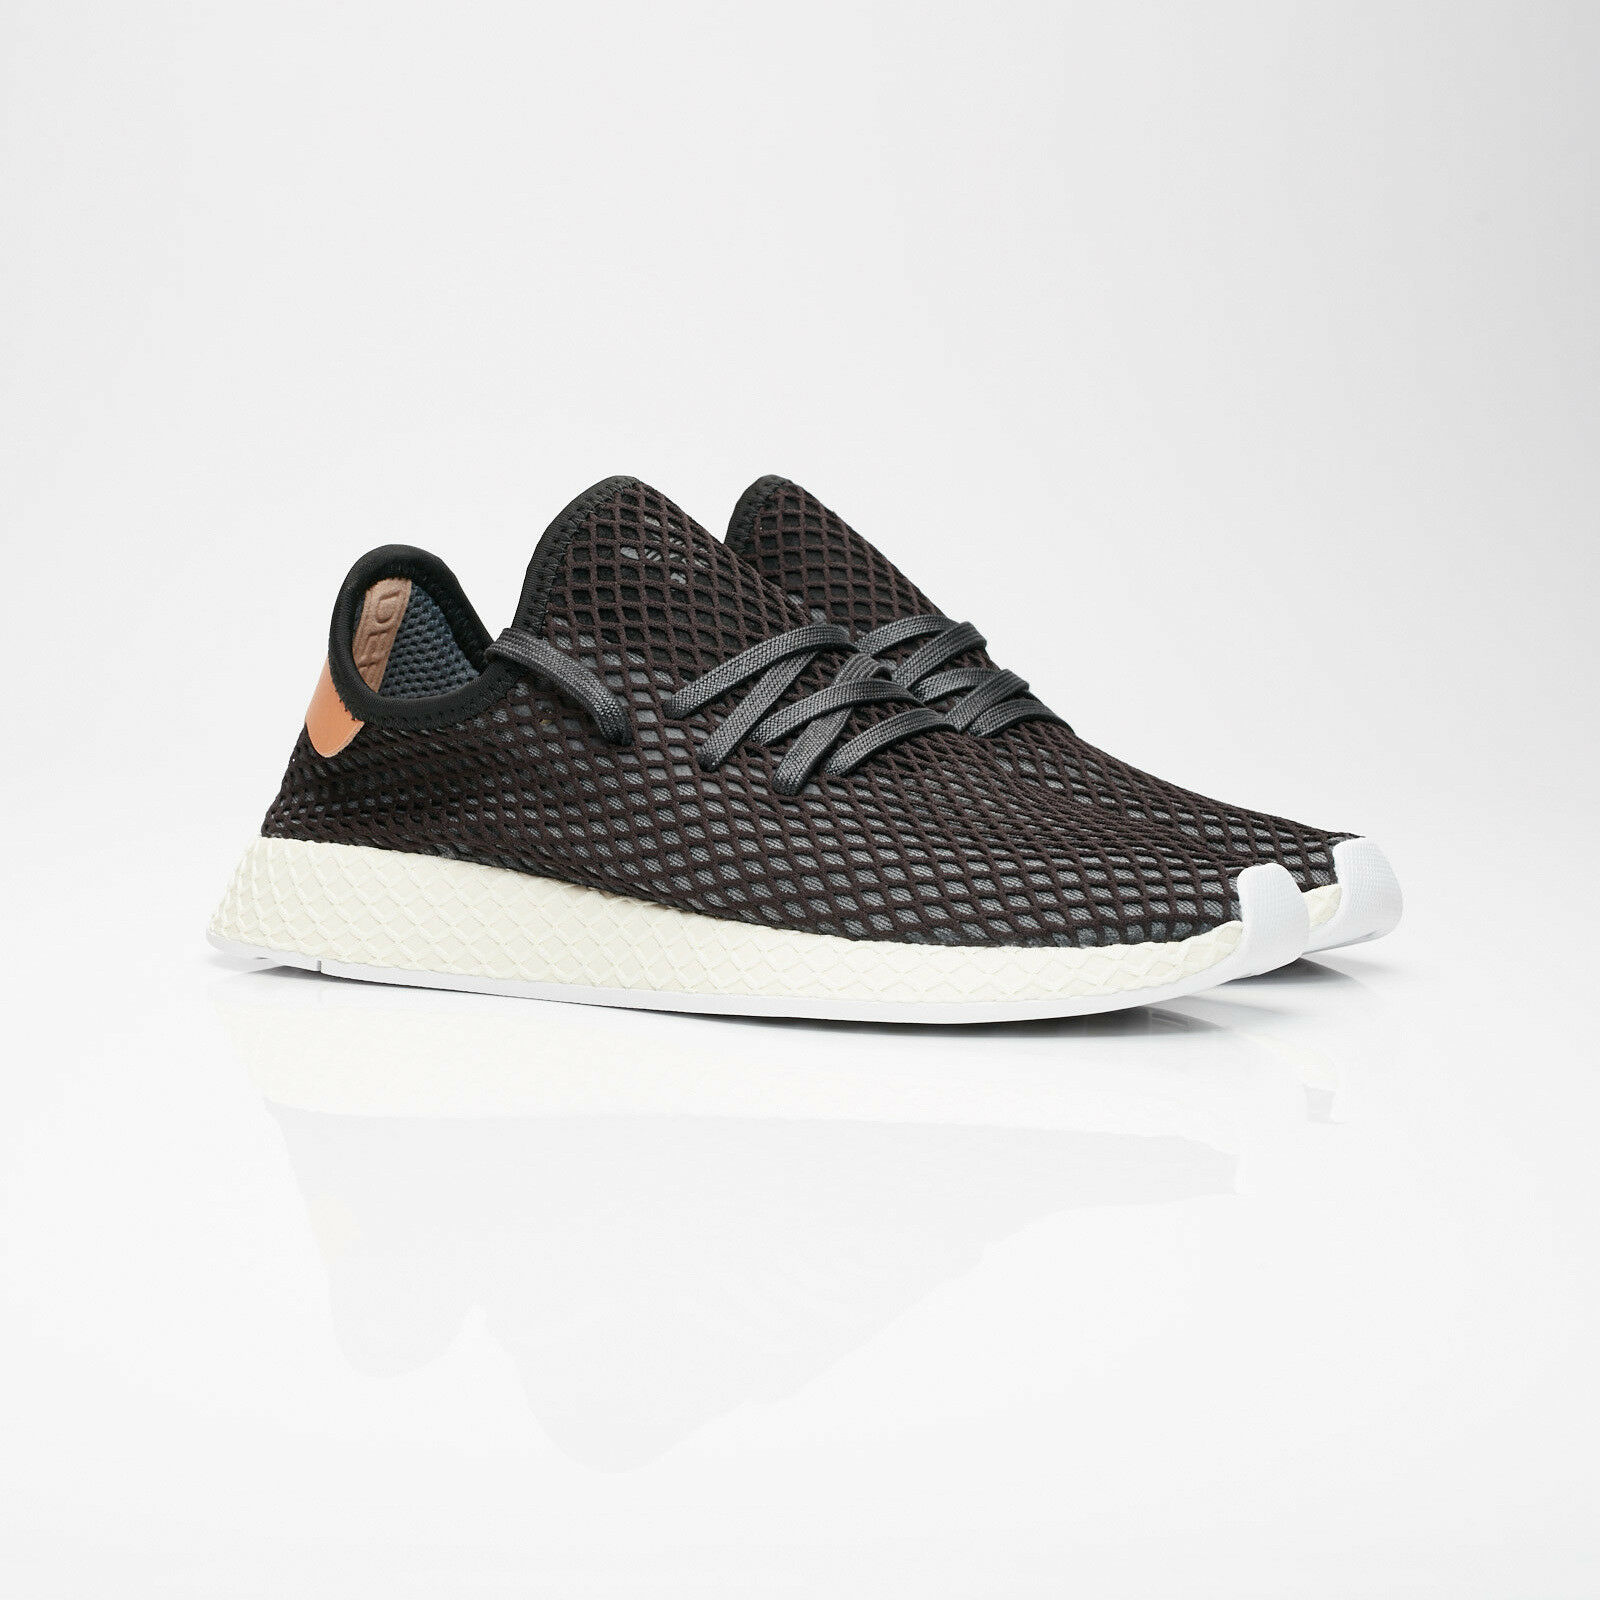 Adidas originals deerupt lifestyle läufer schwarz ashpea männer lifestyle deerupt sneaker fitnessstudio b41758 2d1826